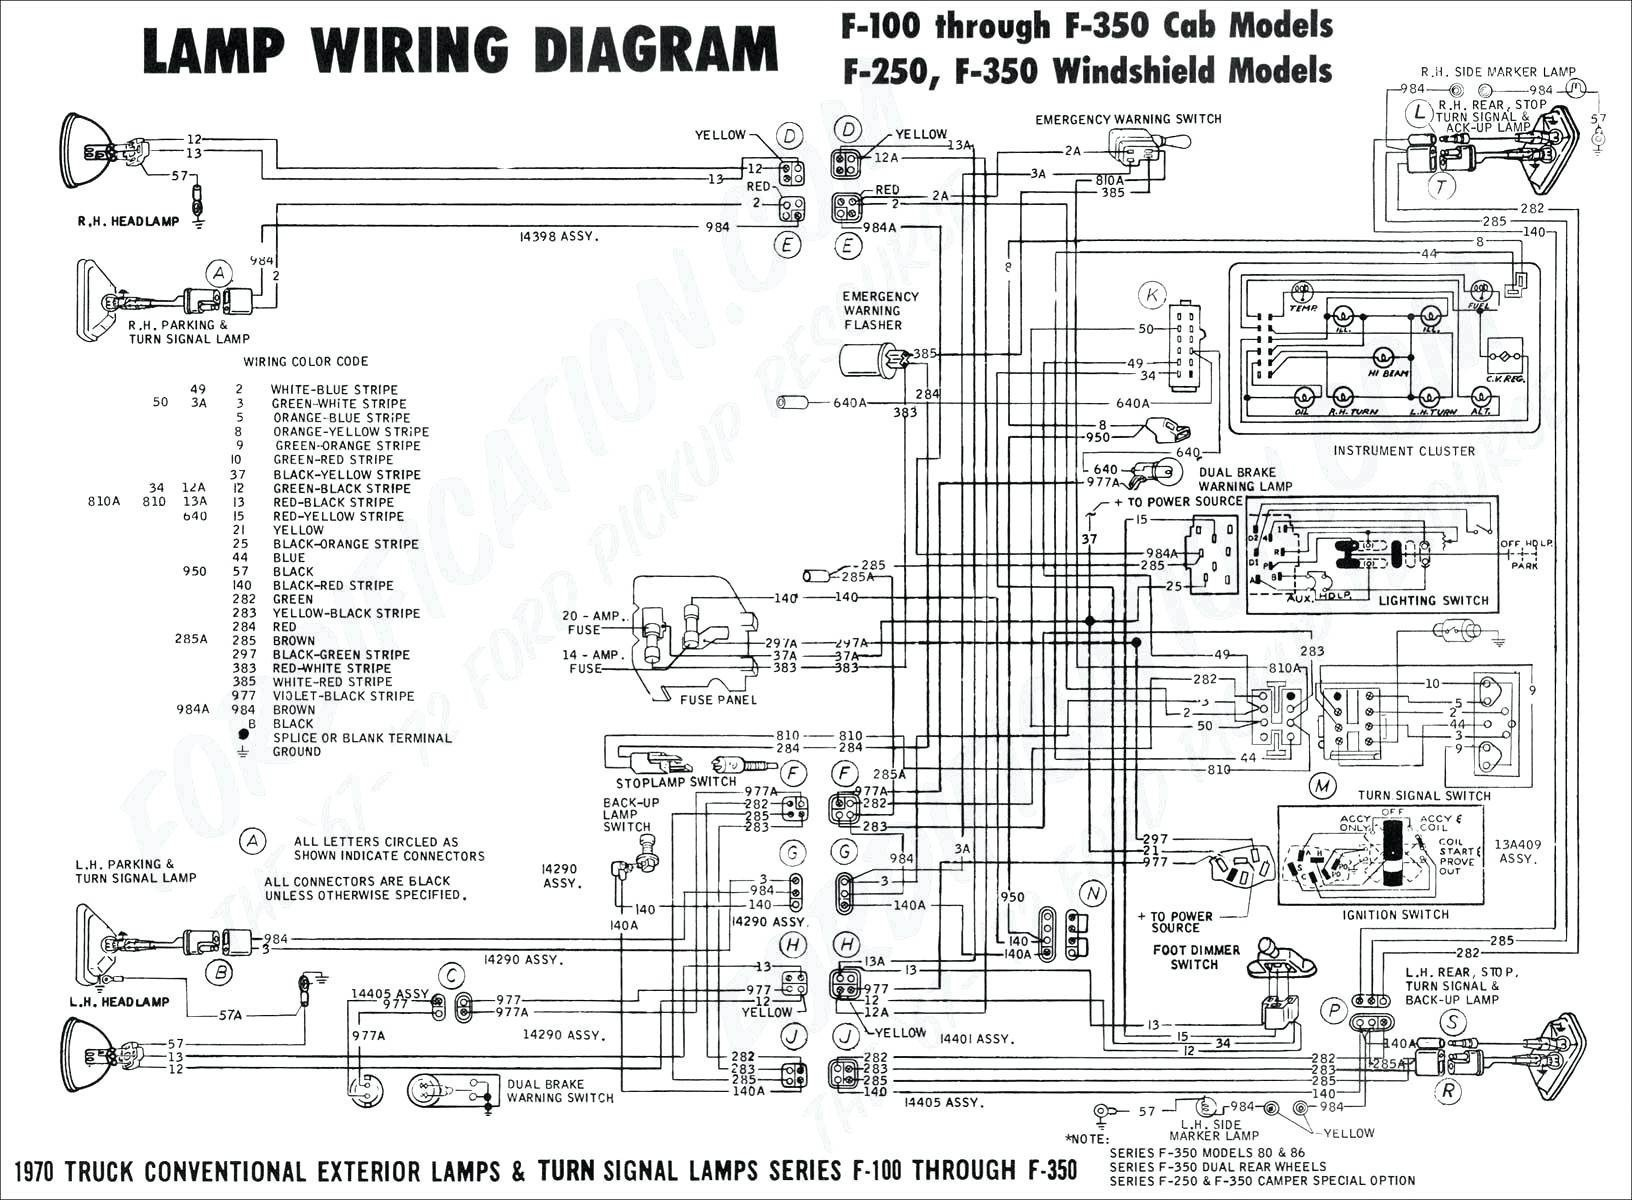 2001 Mazda Tribute V6 Engine Diagram 2001 Dodge Durango Parts Diagram Start Building A Wiring Diagram • Of 2001 Mazda Tribute V6 Engine Diagram